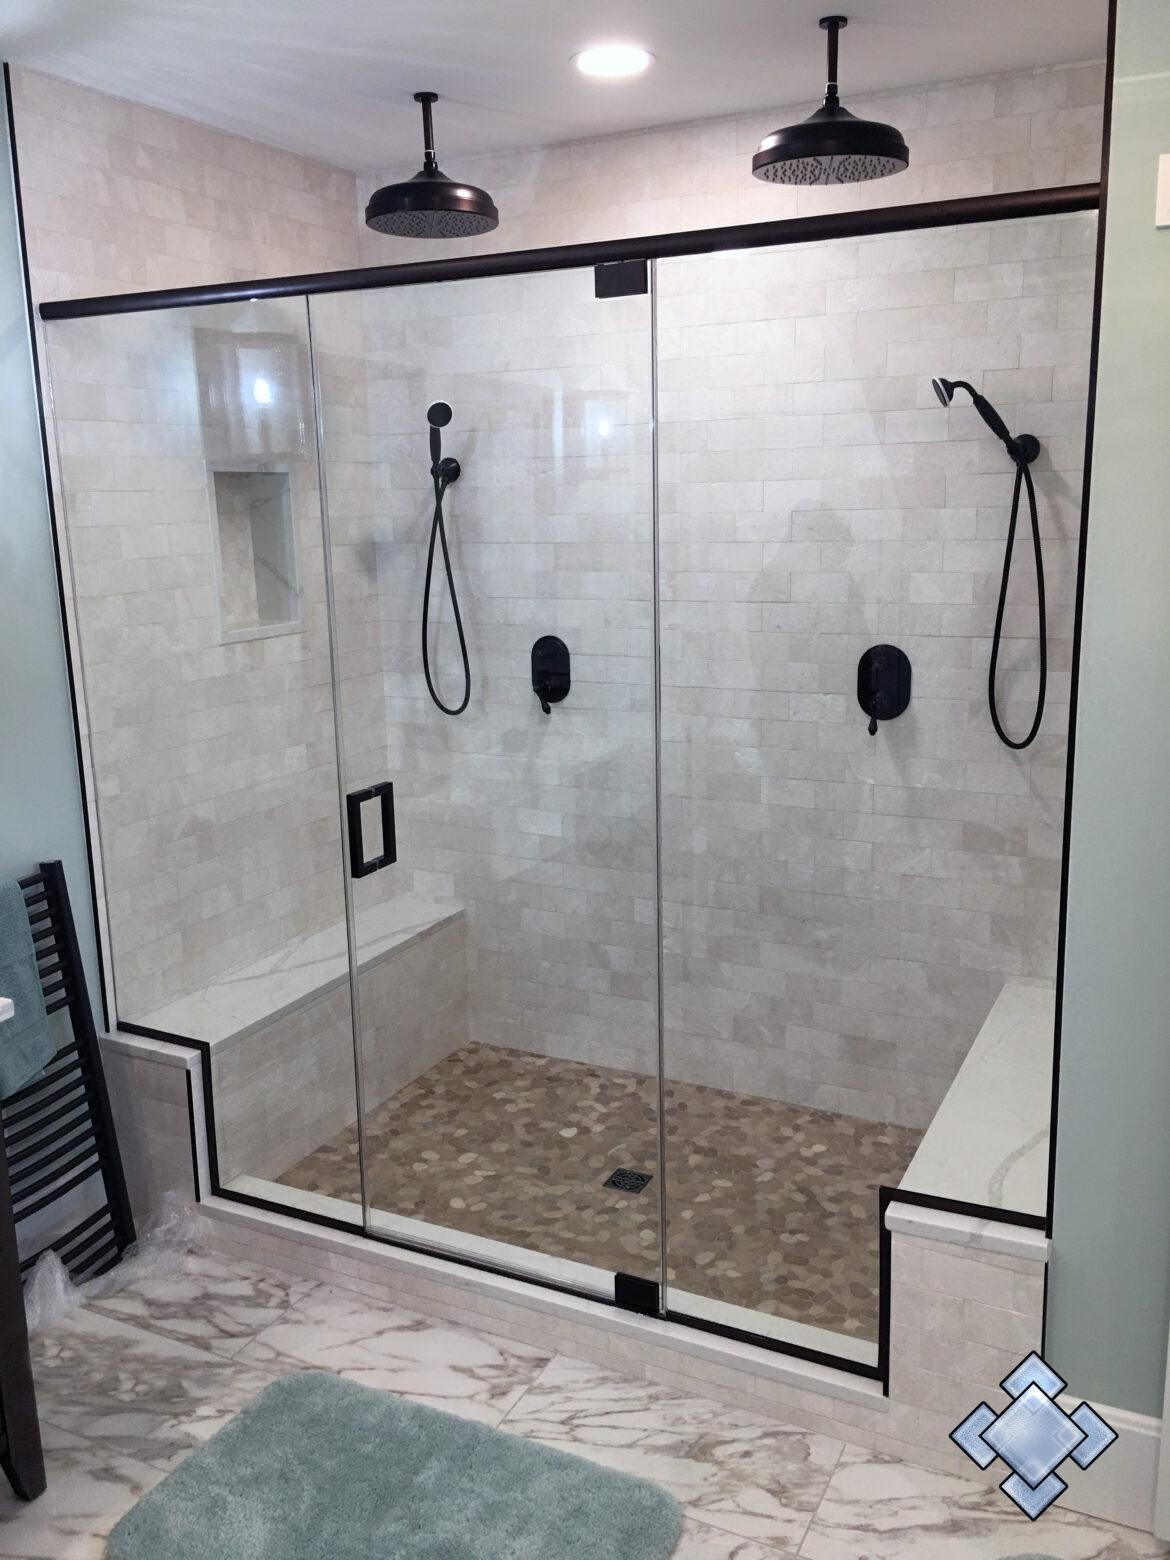 Shower door with oil rubbed bronze hardware and header